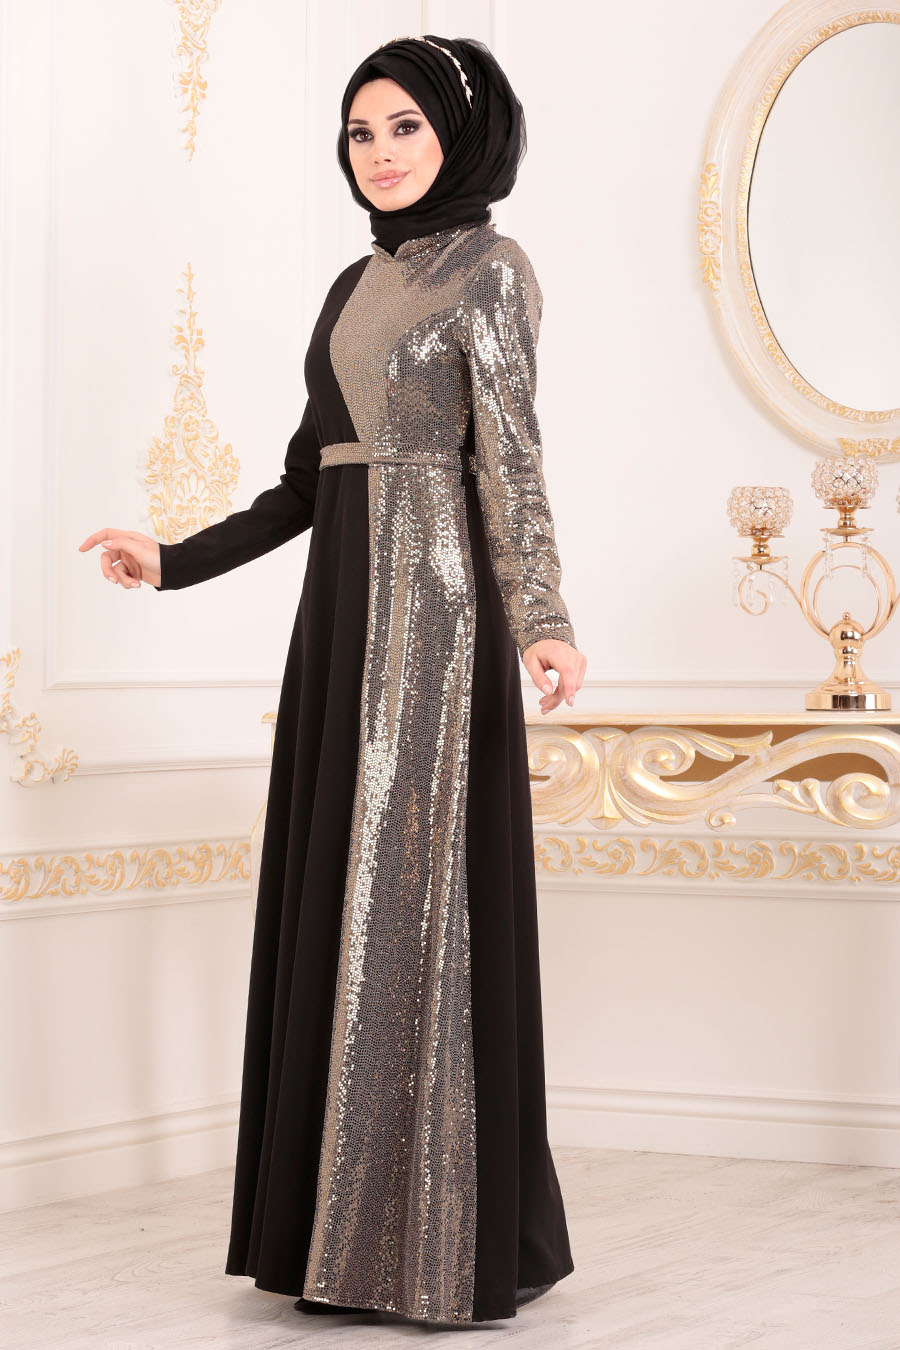 Neva Style - Gold Hijab Evening Dress 1234GOLD